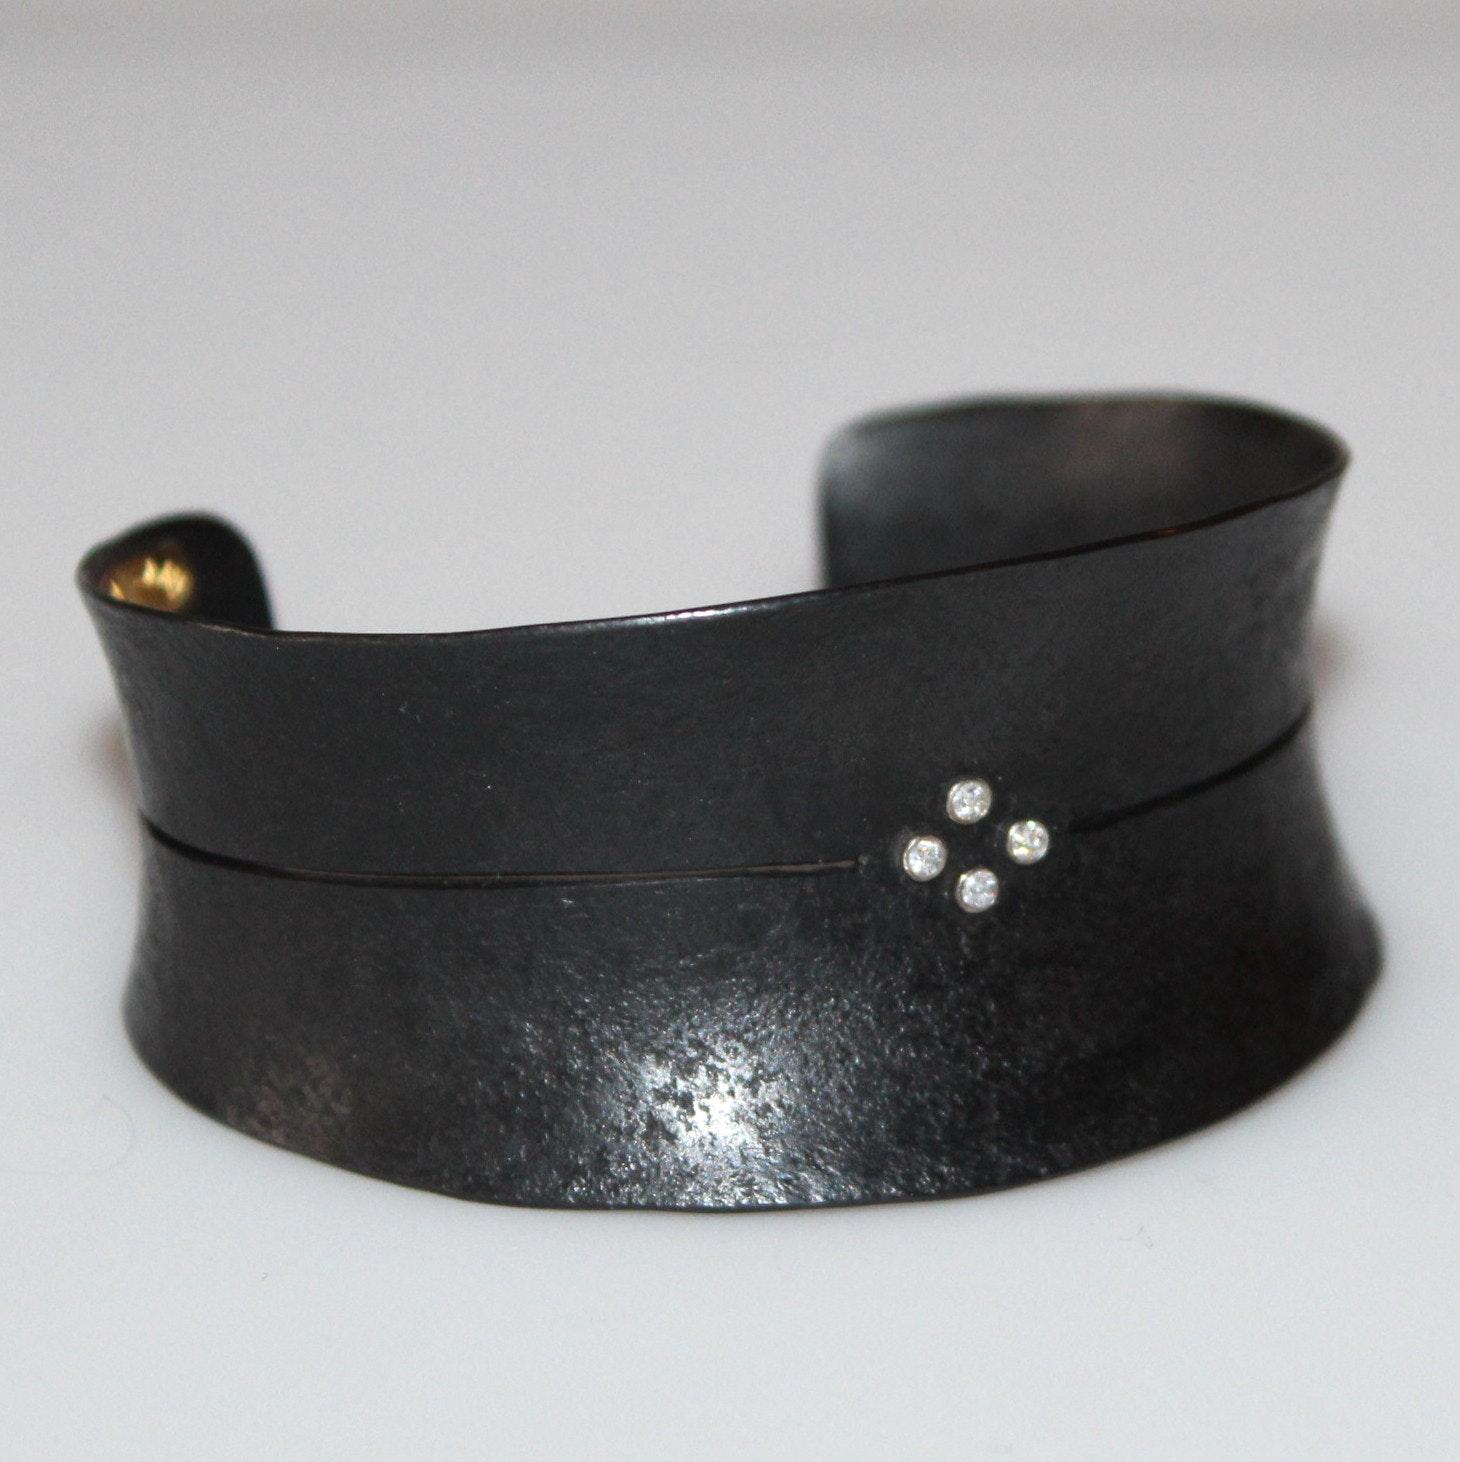 Starlight Cuff Bracelet by Pat Flynn